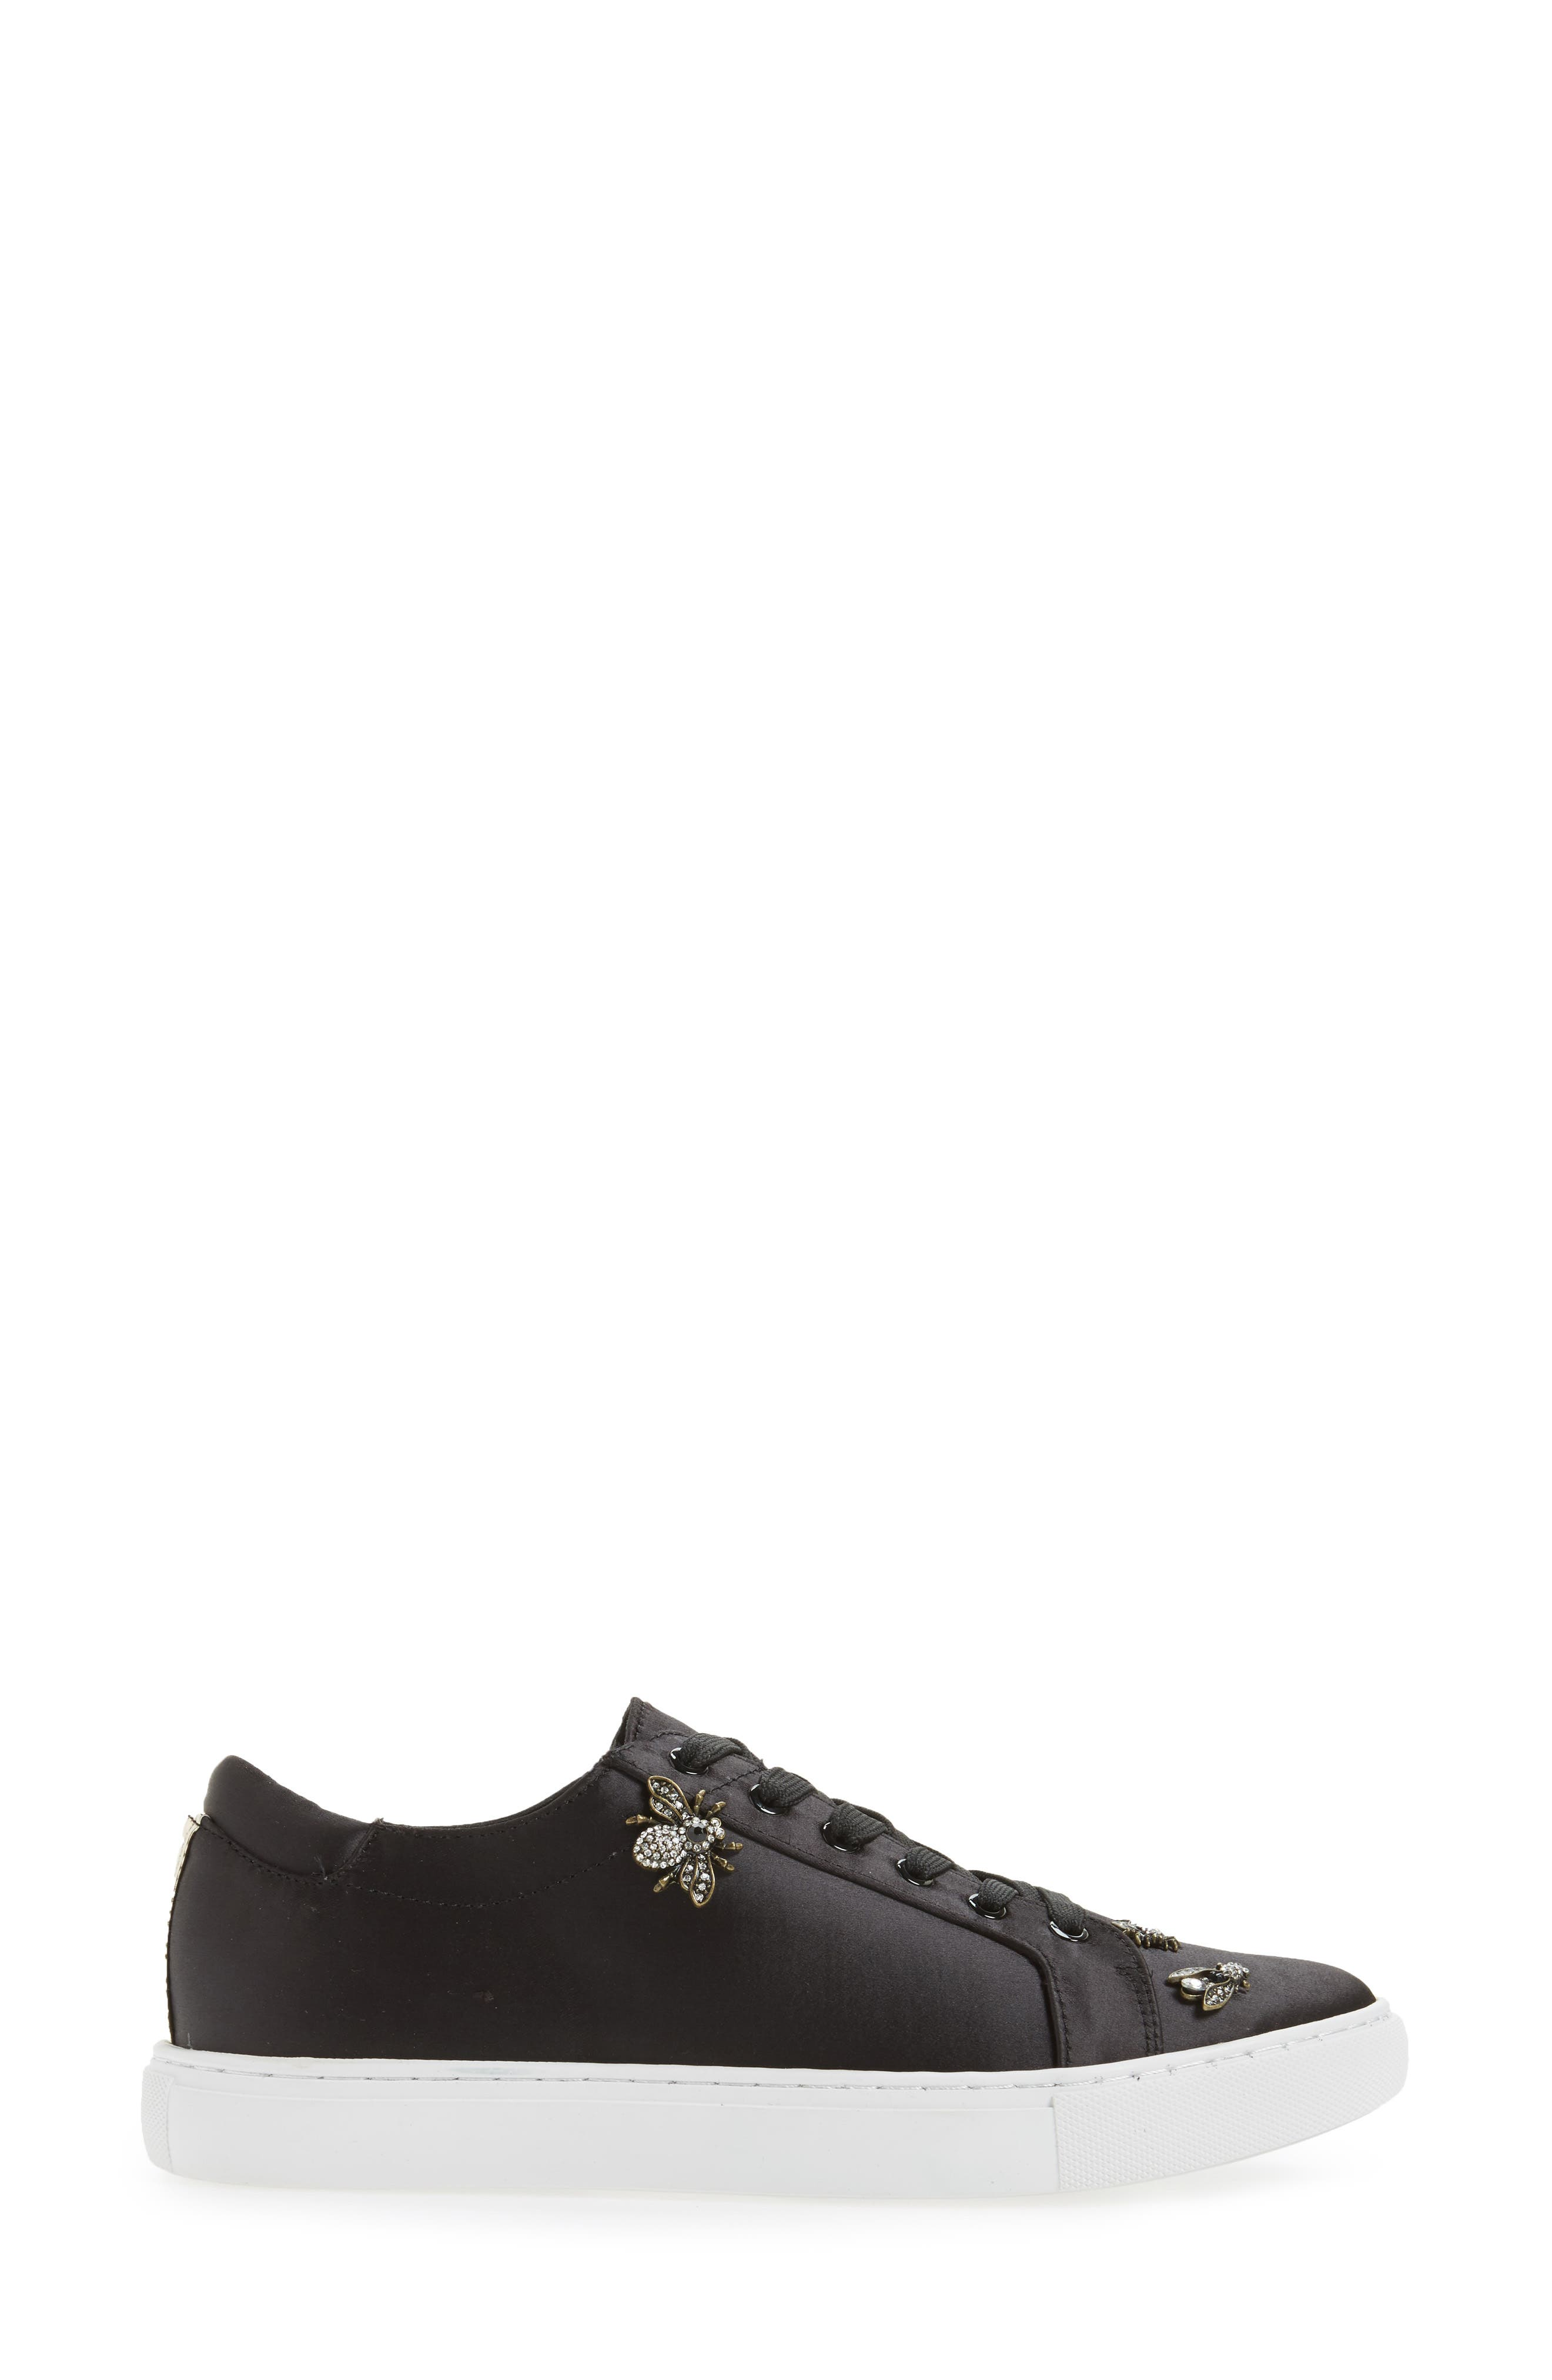 'Kam' Sneaker,                             Alternate thumbnail 3, color,                             Black Satin